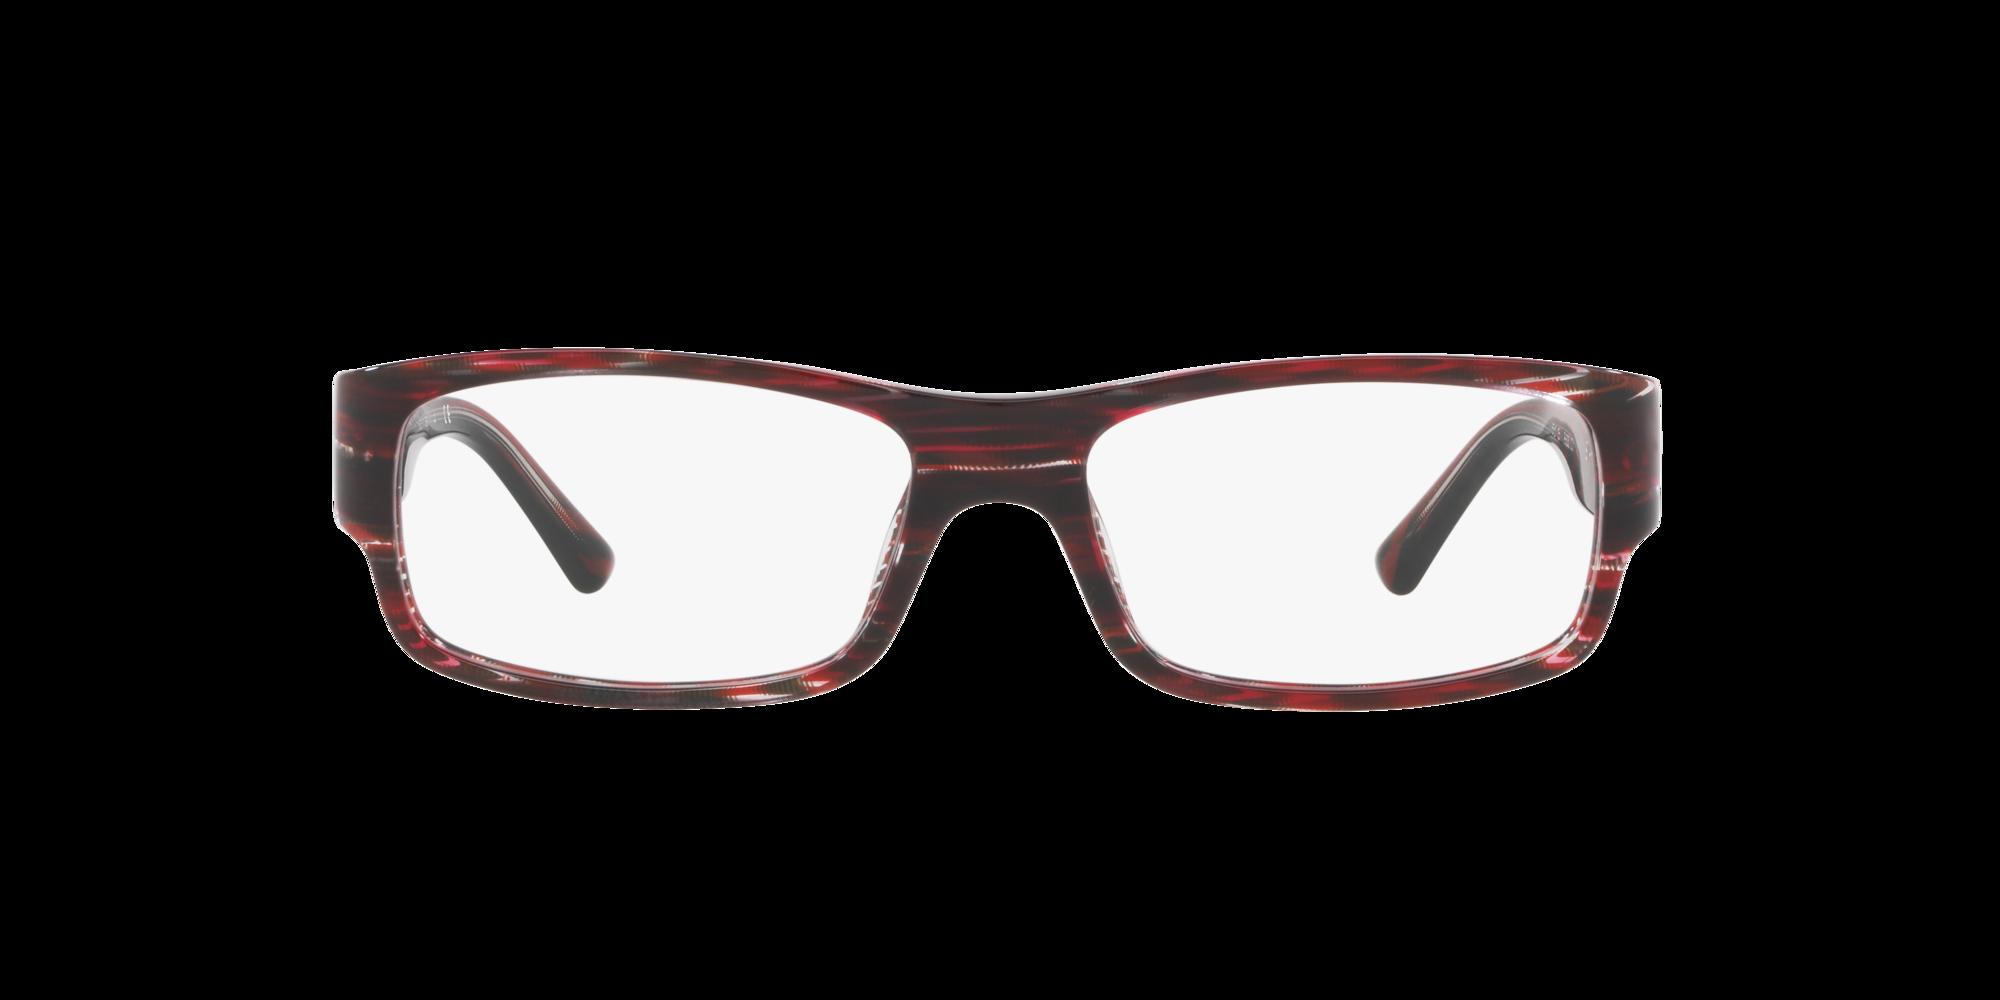 Image for SH3052 from LensCrafters | Glasses, Prescription Glasses Online, Eyewear